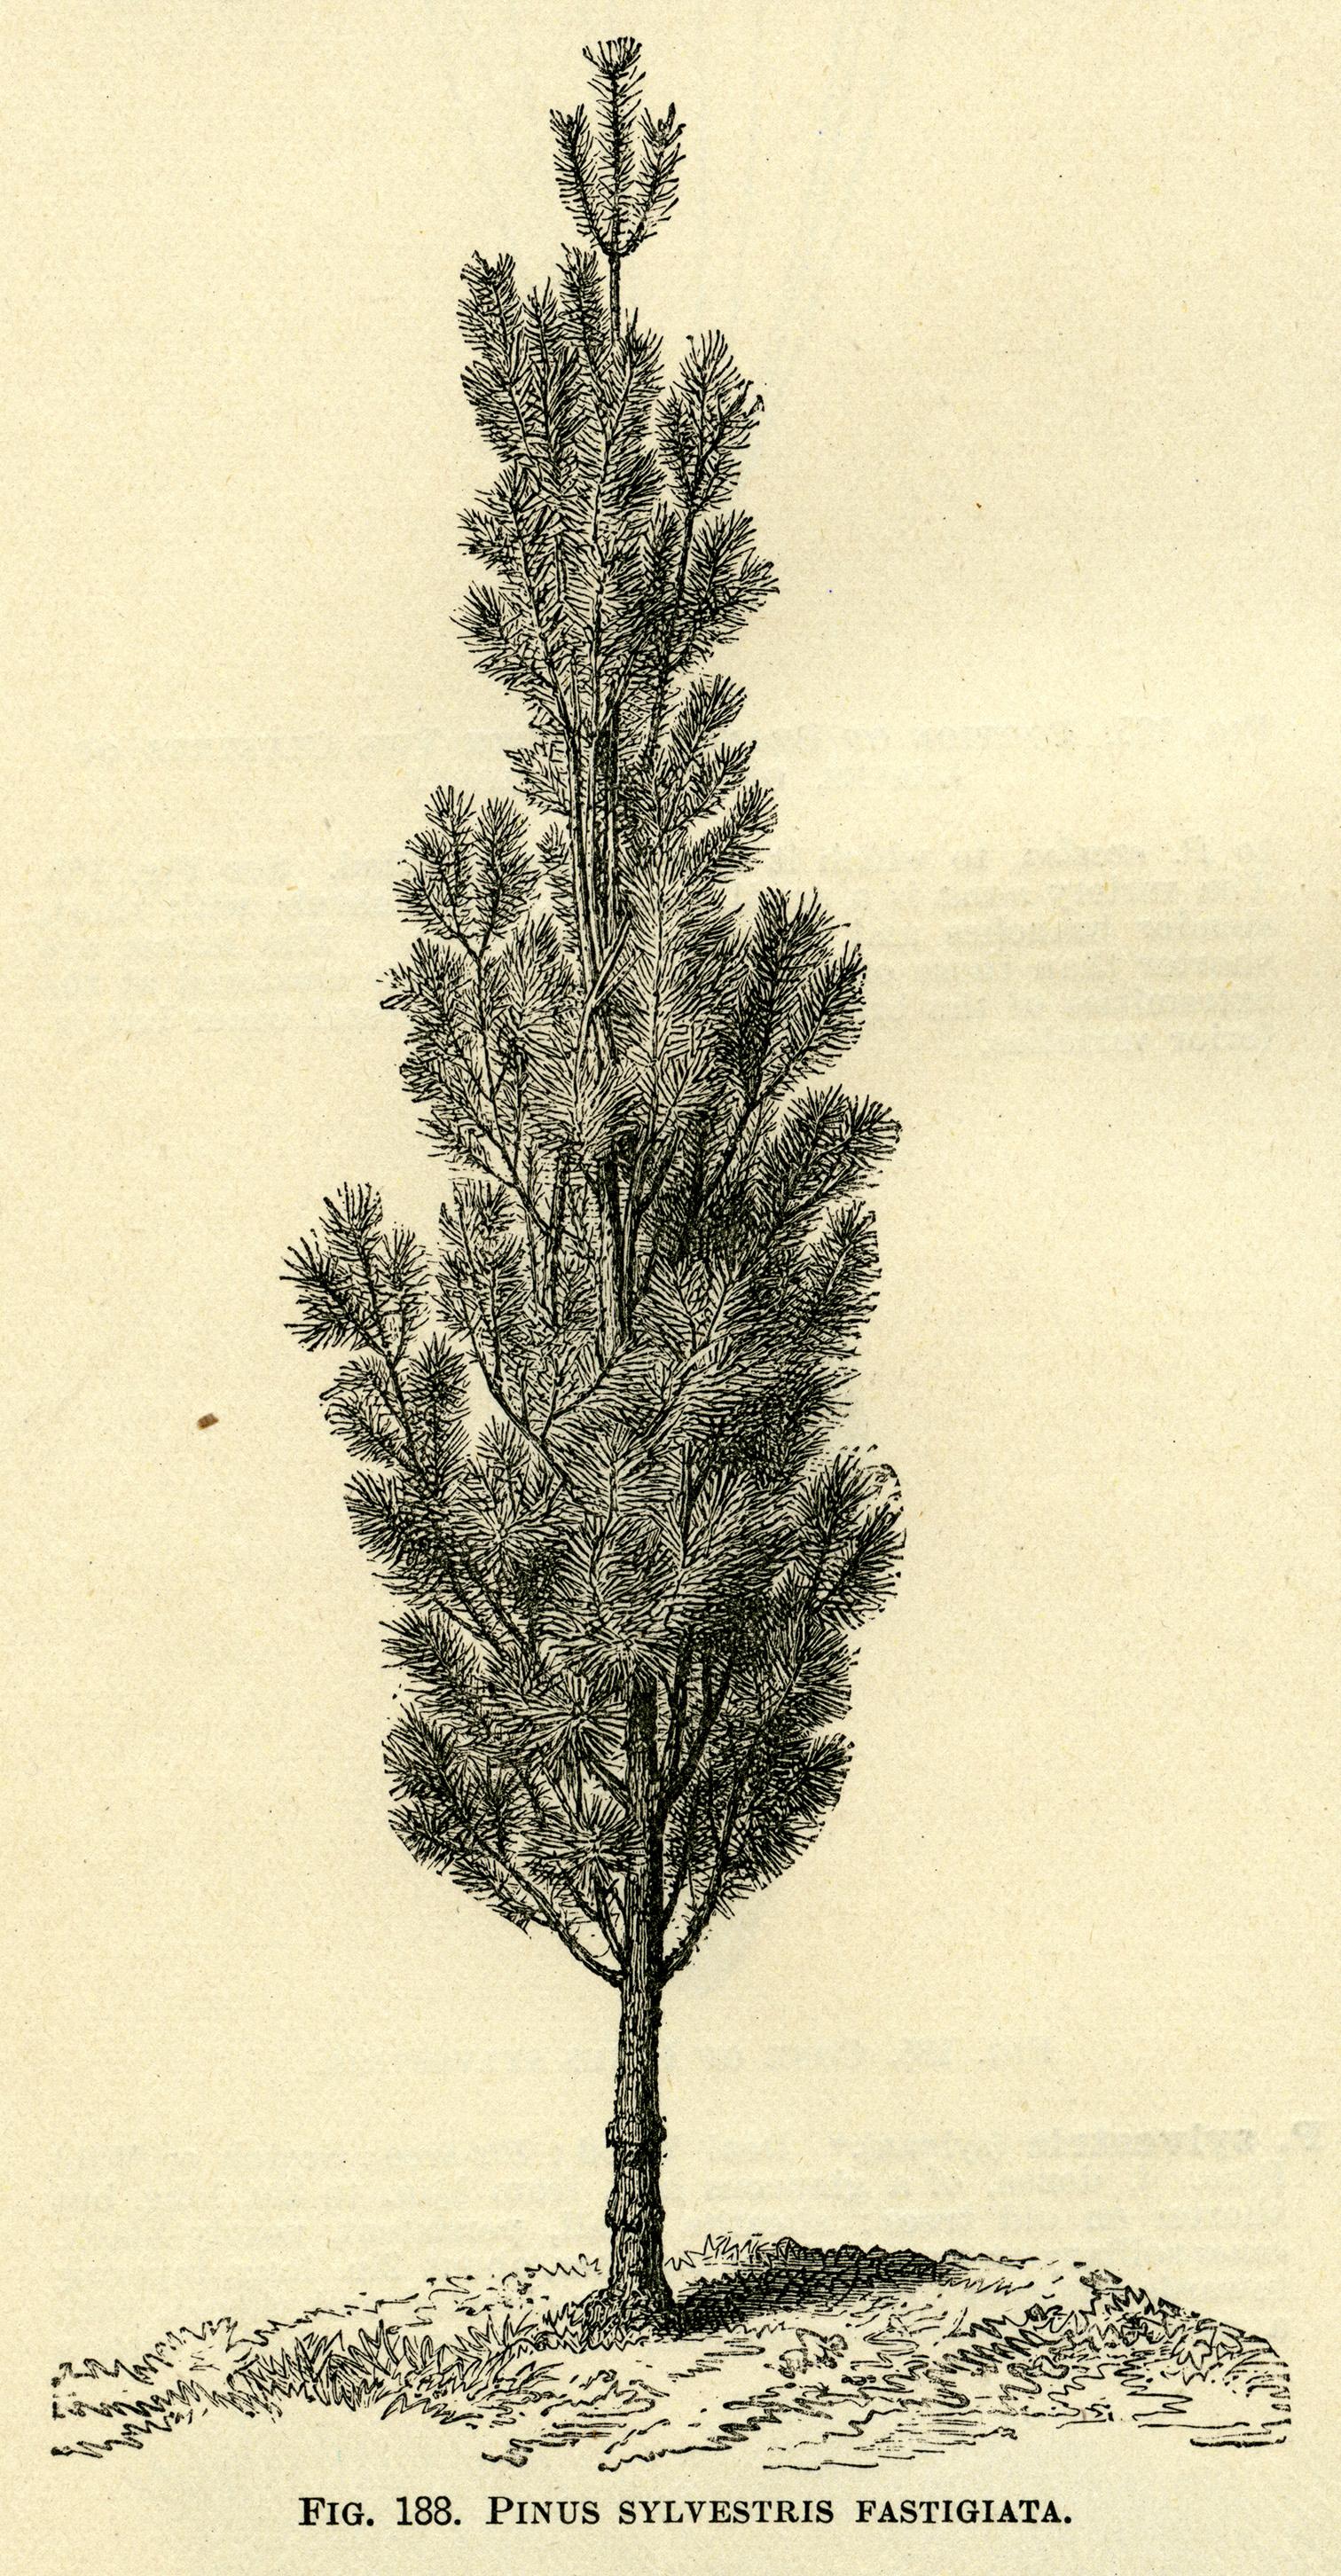 Black and White Illustration Inspirational Black and White Graphics Botanical Pine Tree Illustration